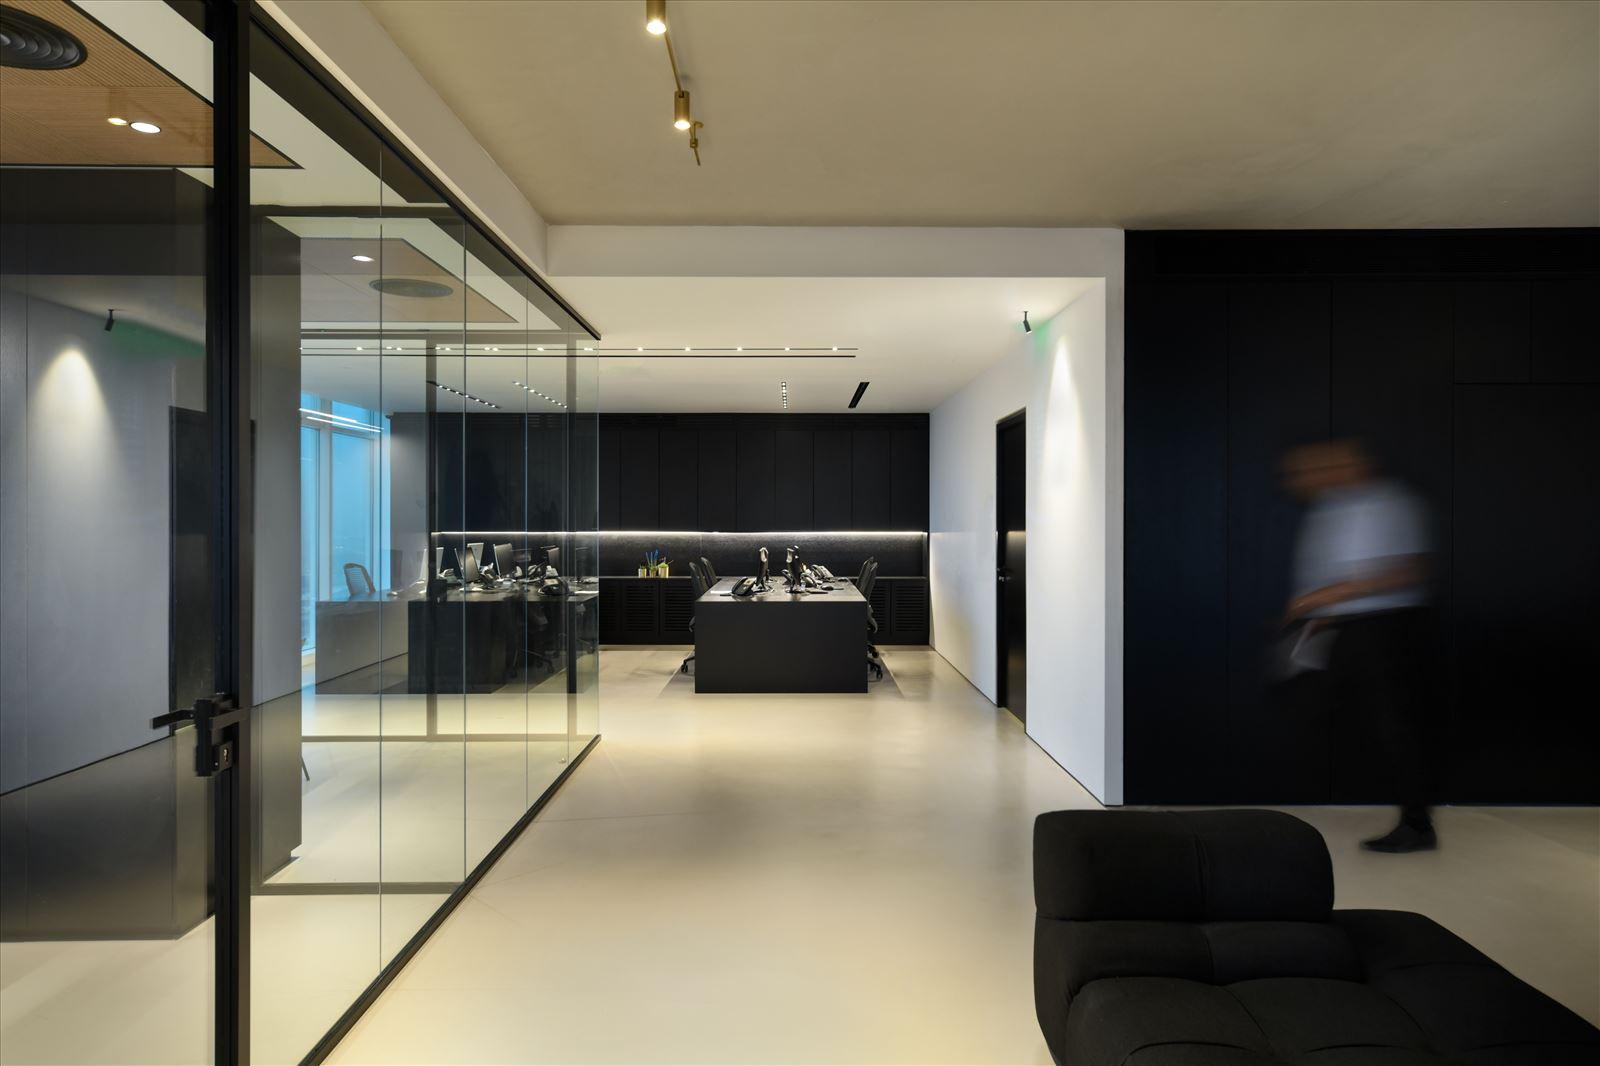 Divident office מרחב המשרד מואר בגופי תאורה בתכנון קמחי תאורה